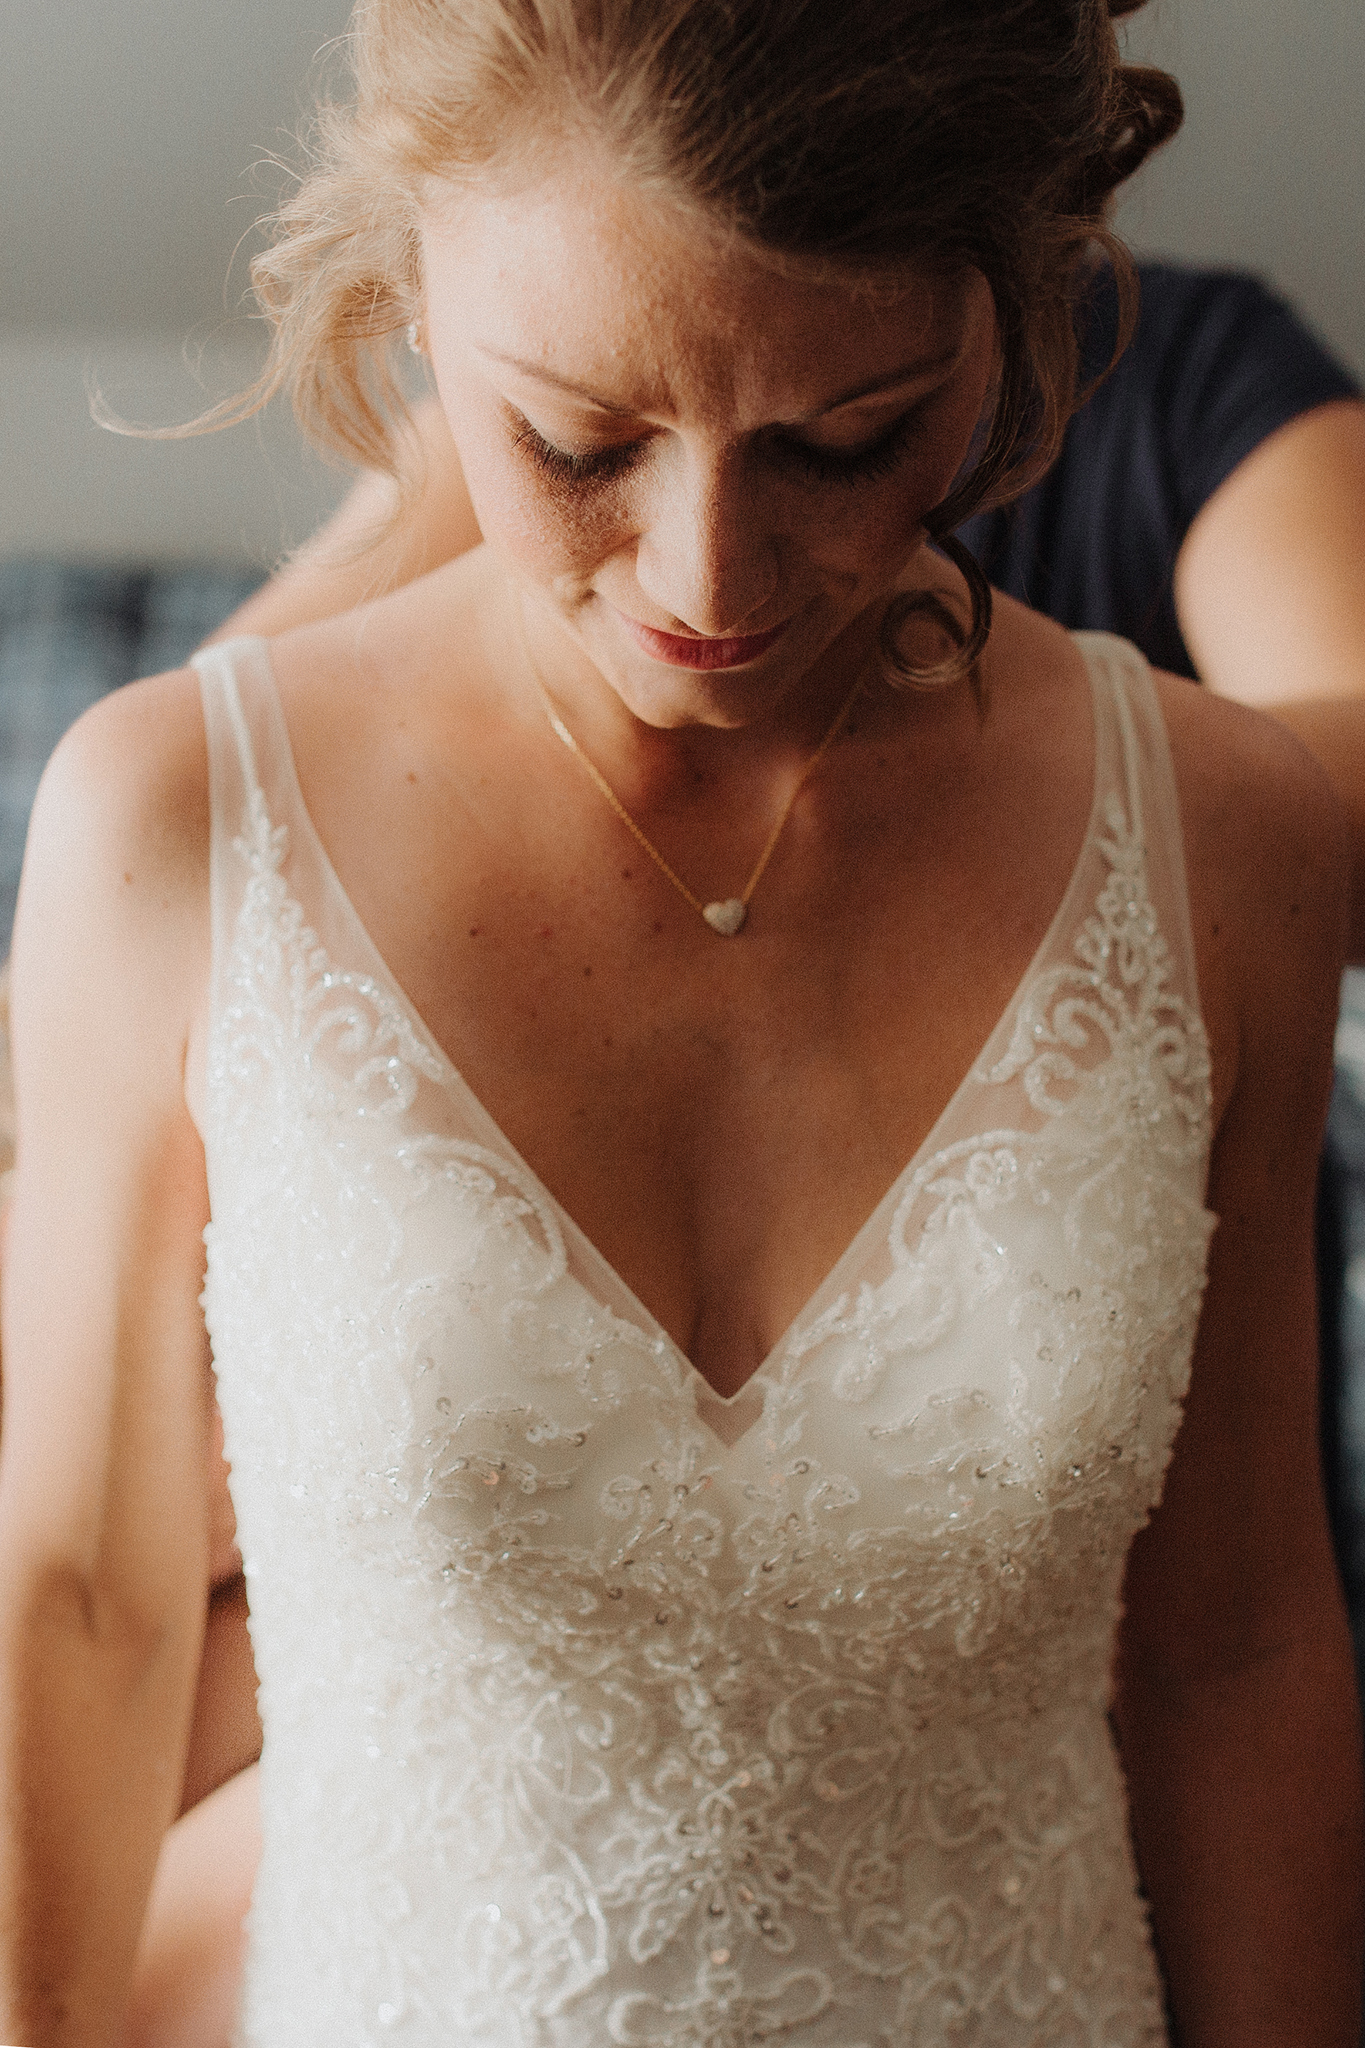 vermont-wedding-photographer-bride-getting-ready-1.jpg